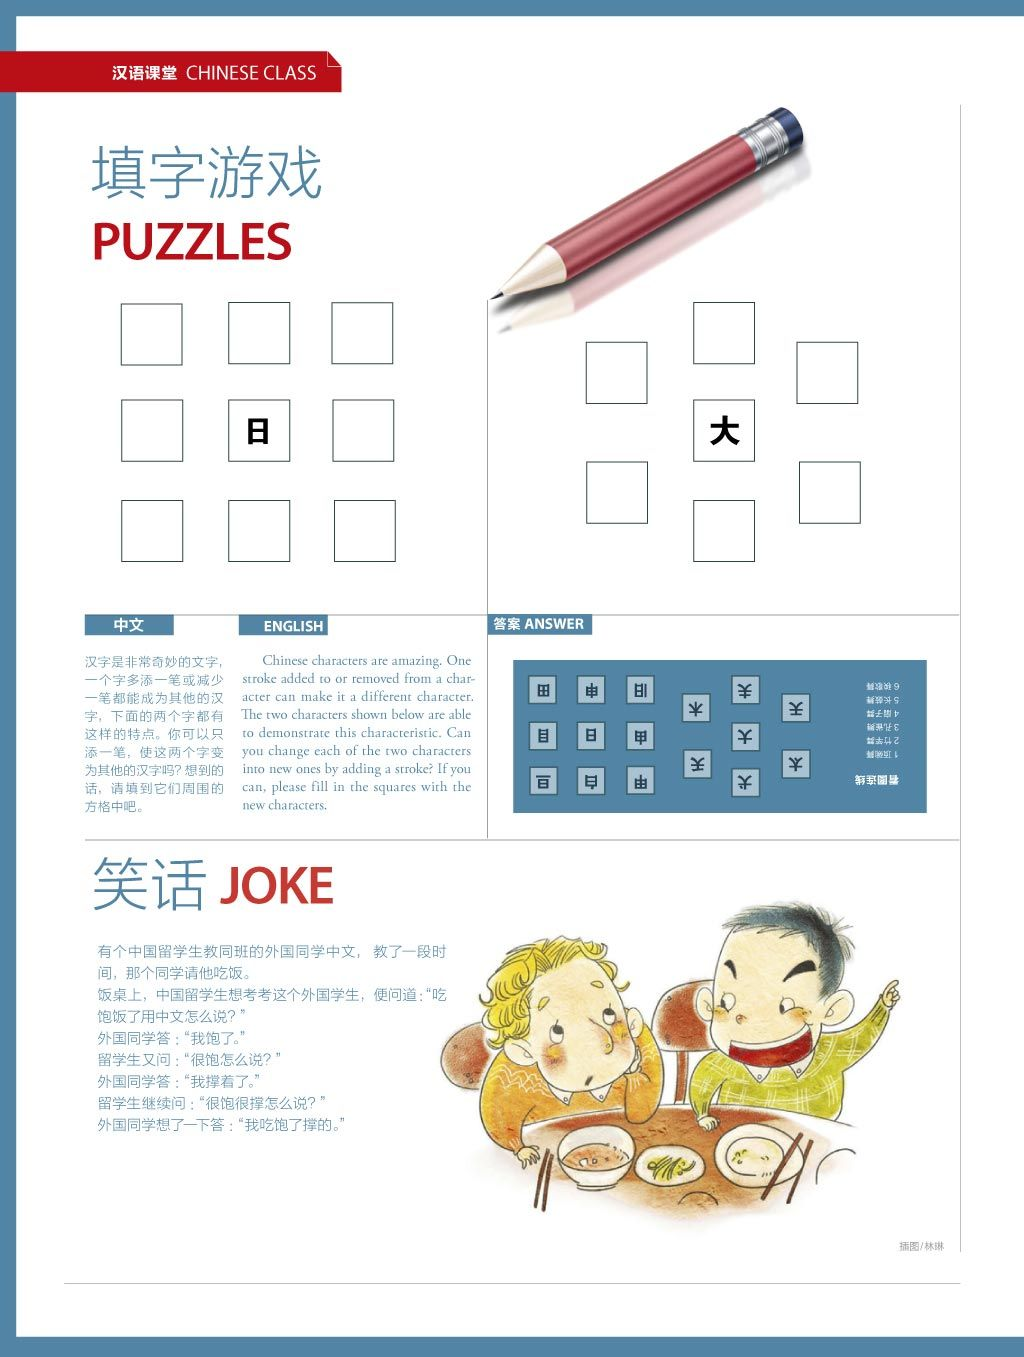 Chinese Class 27 Puzzles Joke Buzzwords